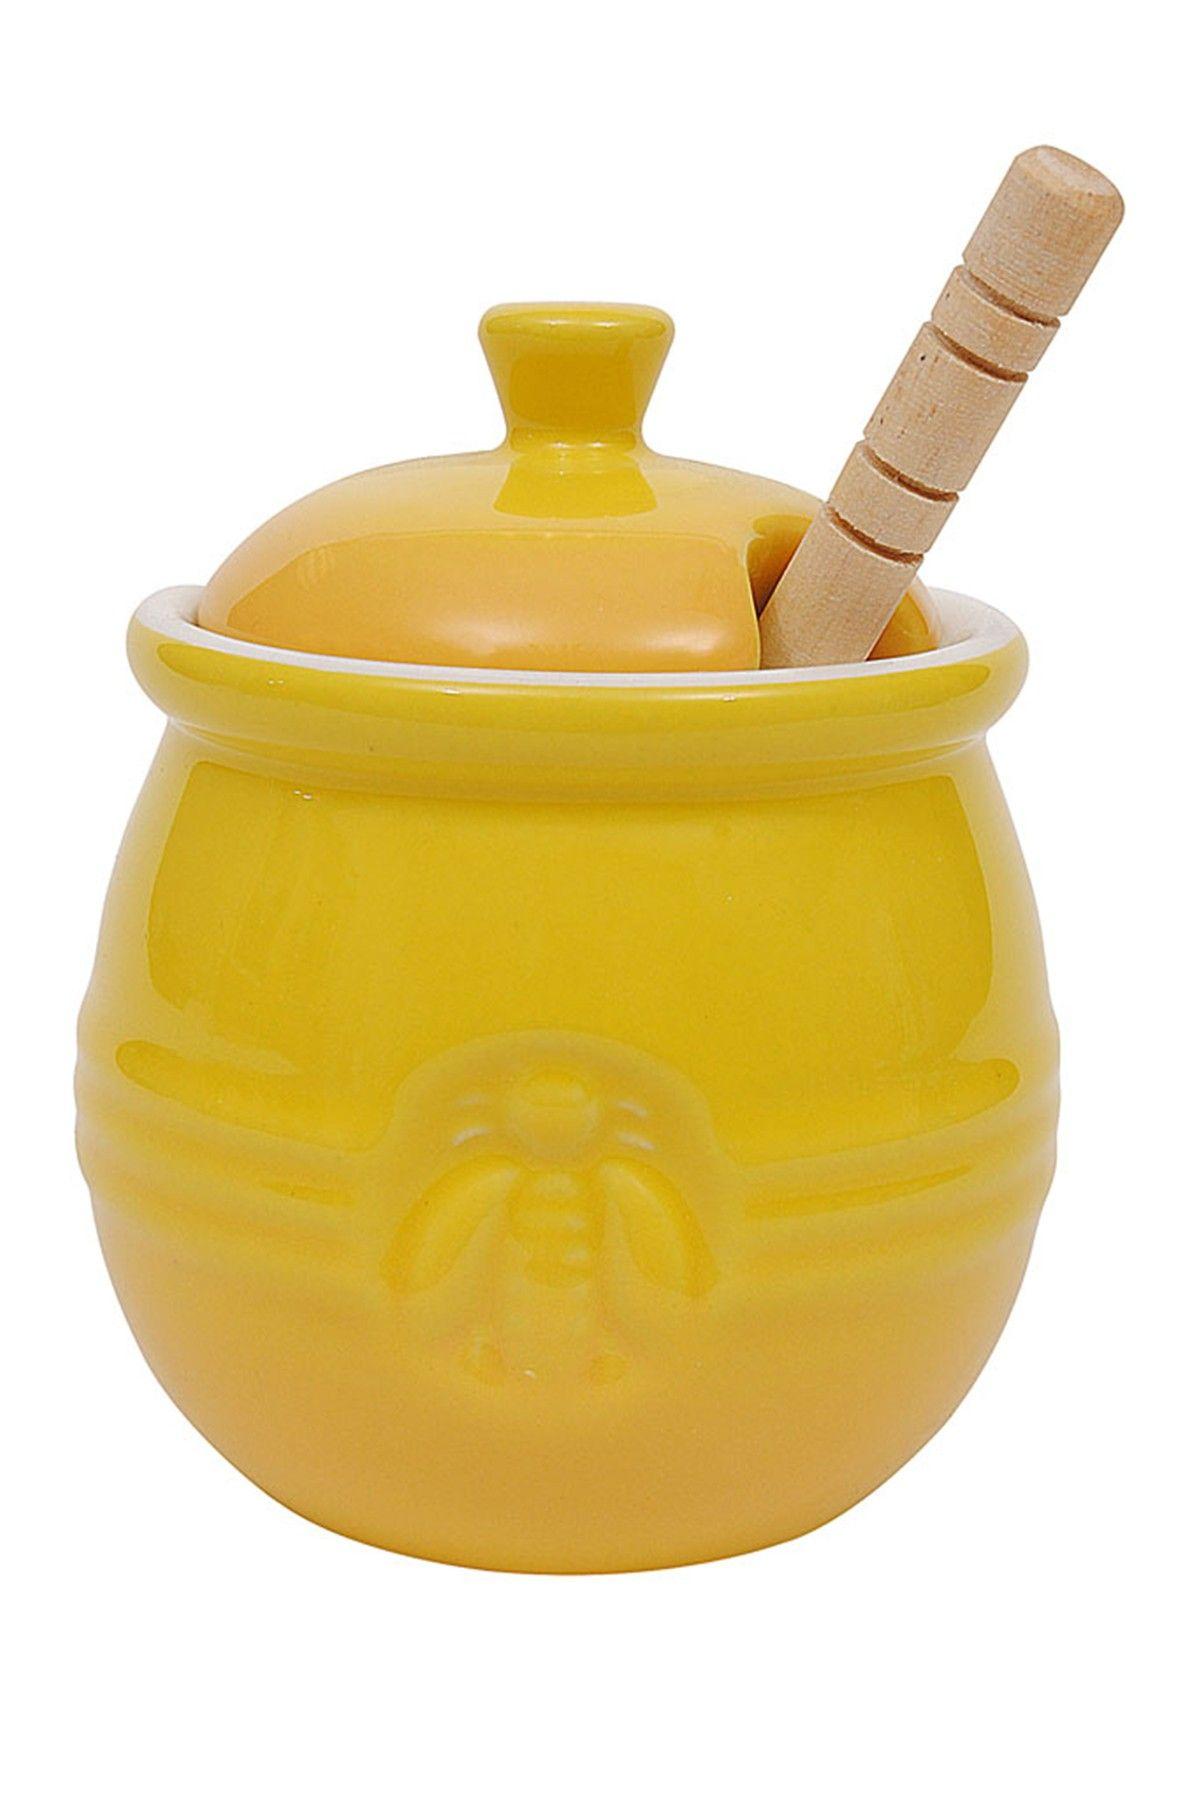 Wood Honey Dipper & Stoneware Honey Pot 2-Piece Set by Creative Co ...